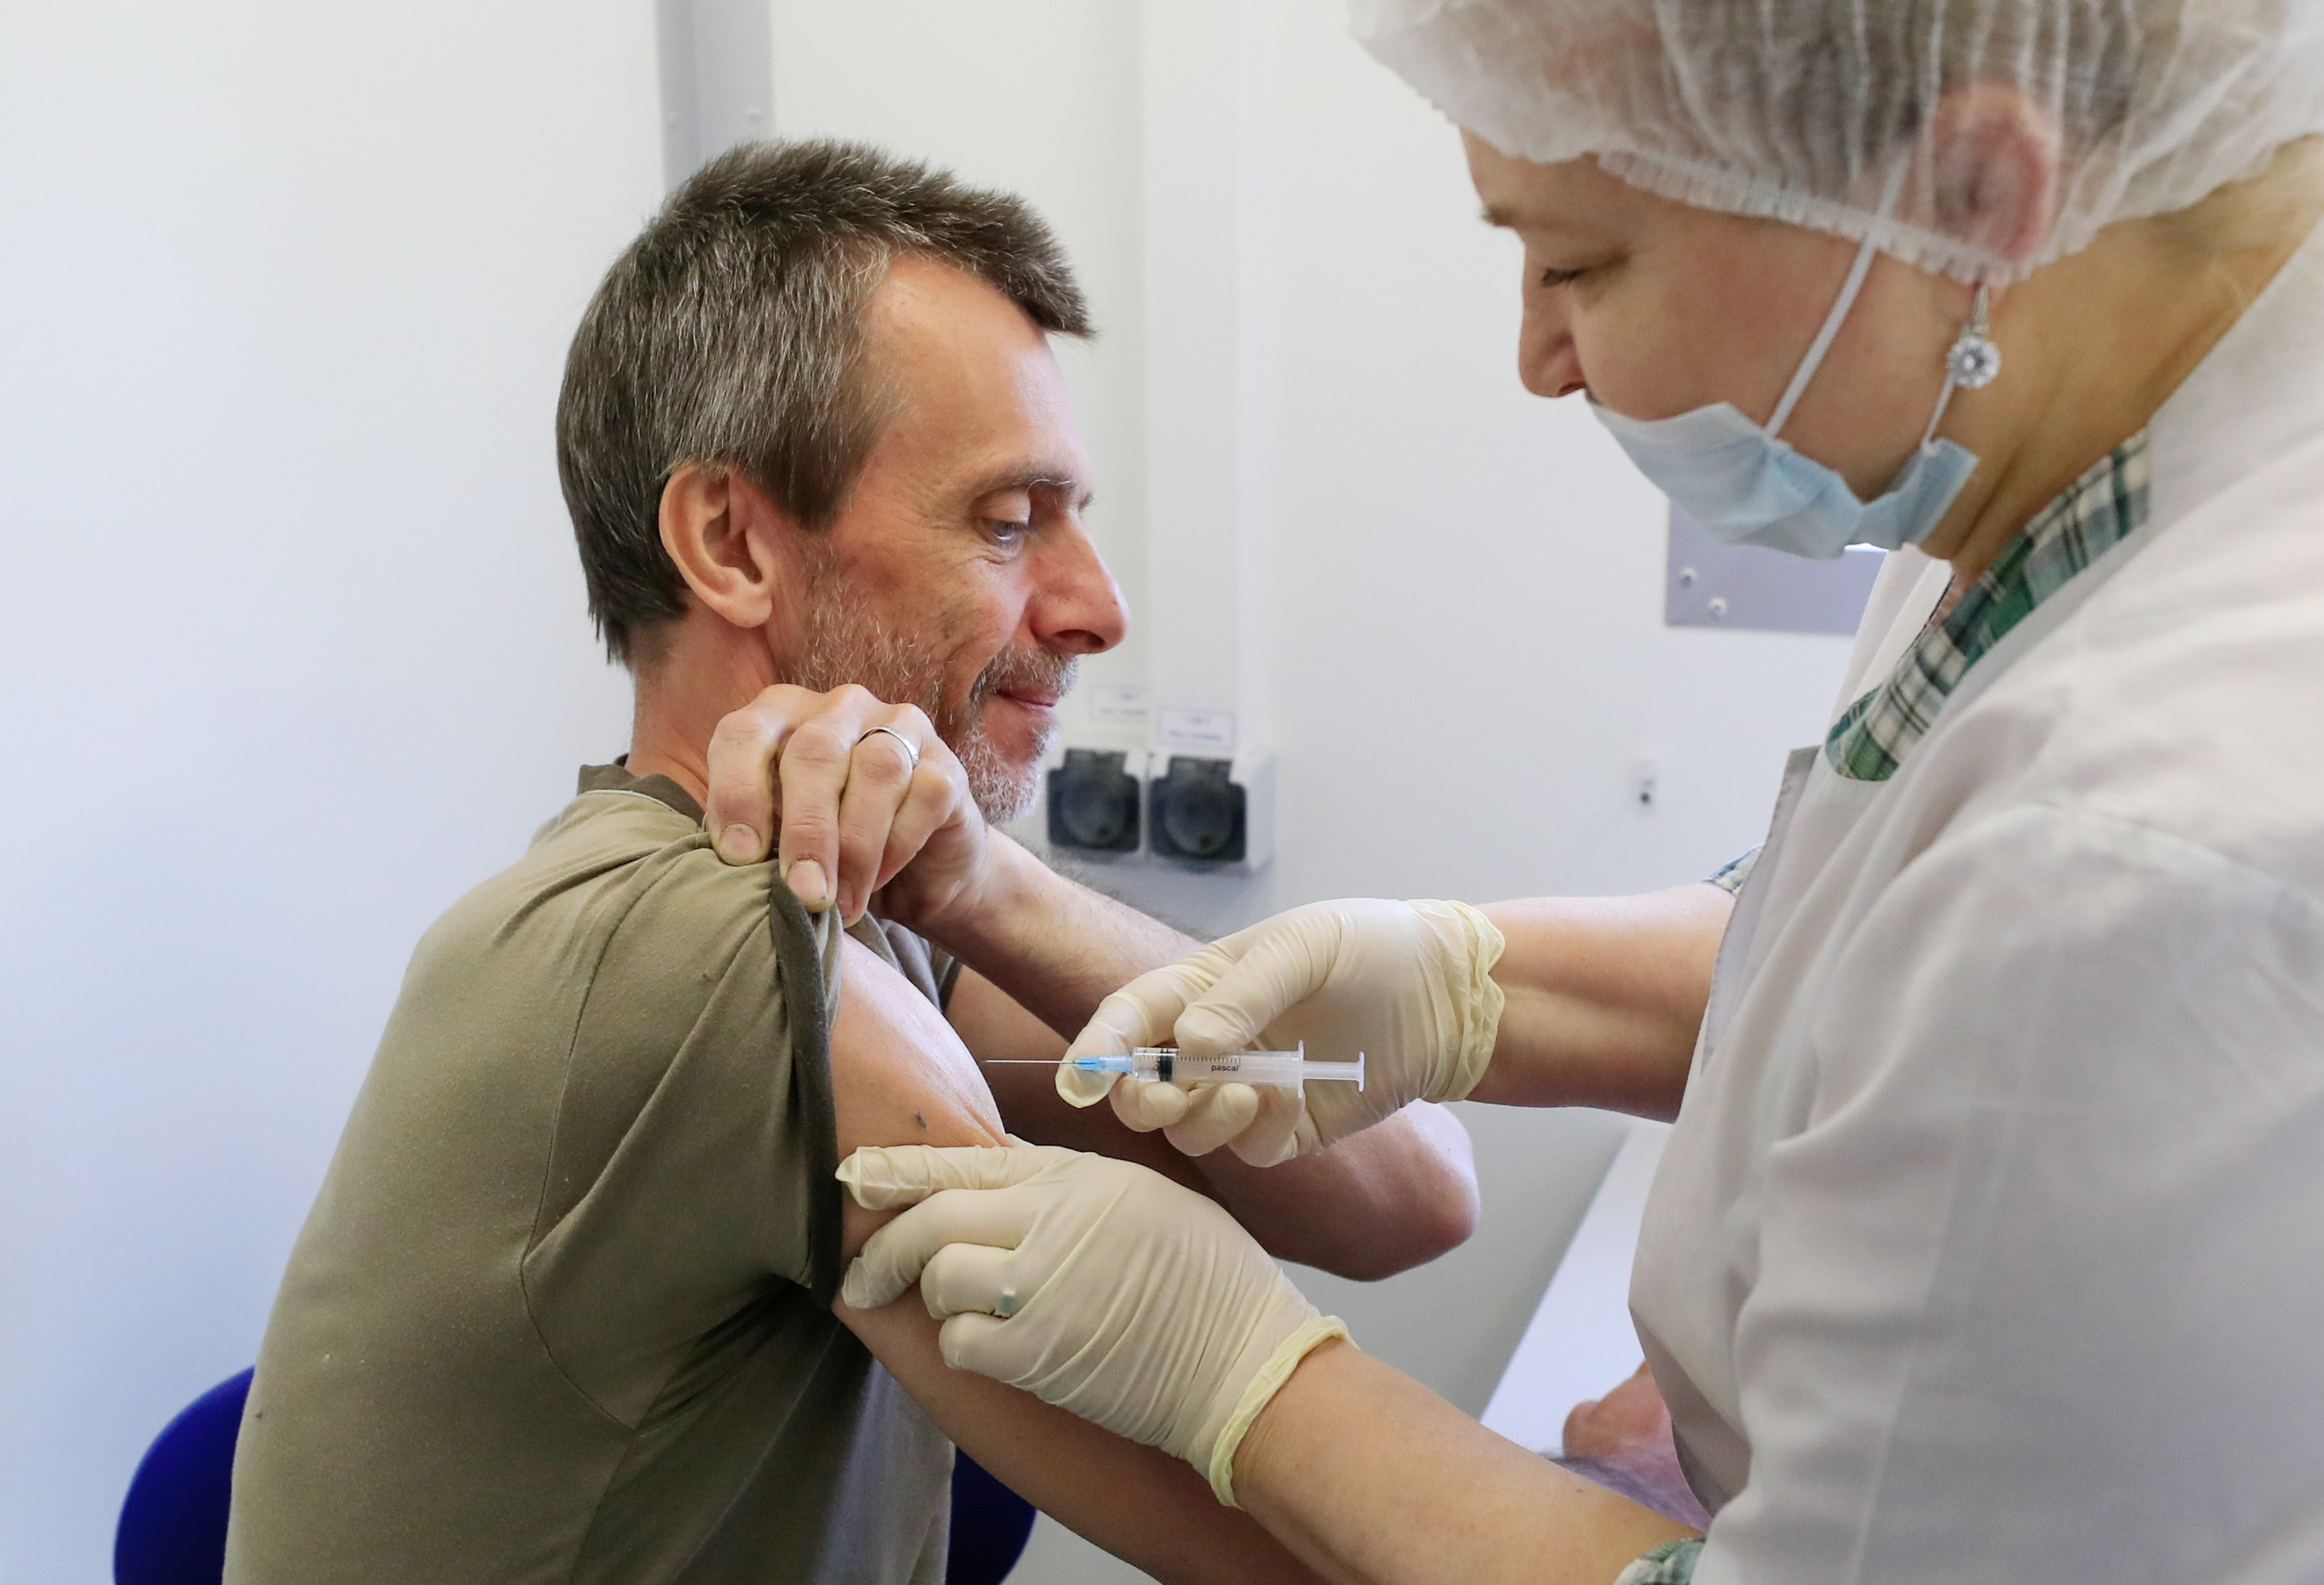 A man receives a dose of Sputnik V (Gam-COVID-Vac) vaccine against the coronavirus disease (COVID-19) at a mobile vaccination centre in a dacha community near the village of Poyarkovo in Moscow Region, Russia May 31, 2021.  REUTERS/Evgenia Novozhenina